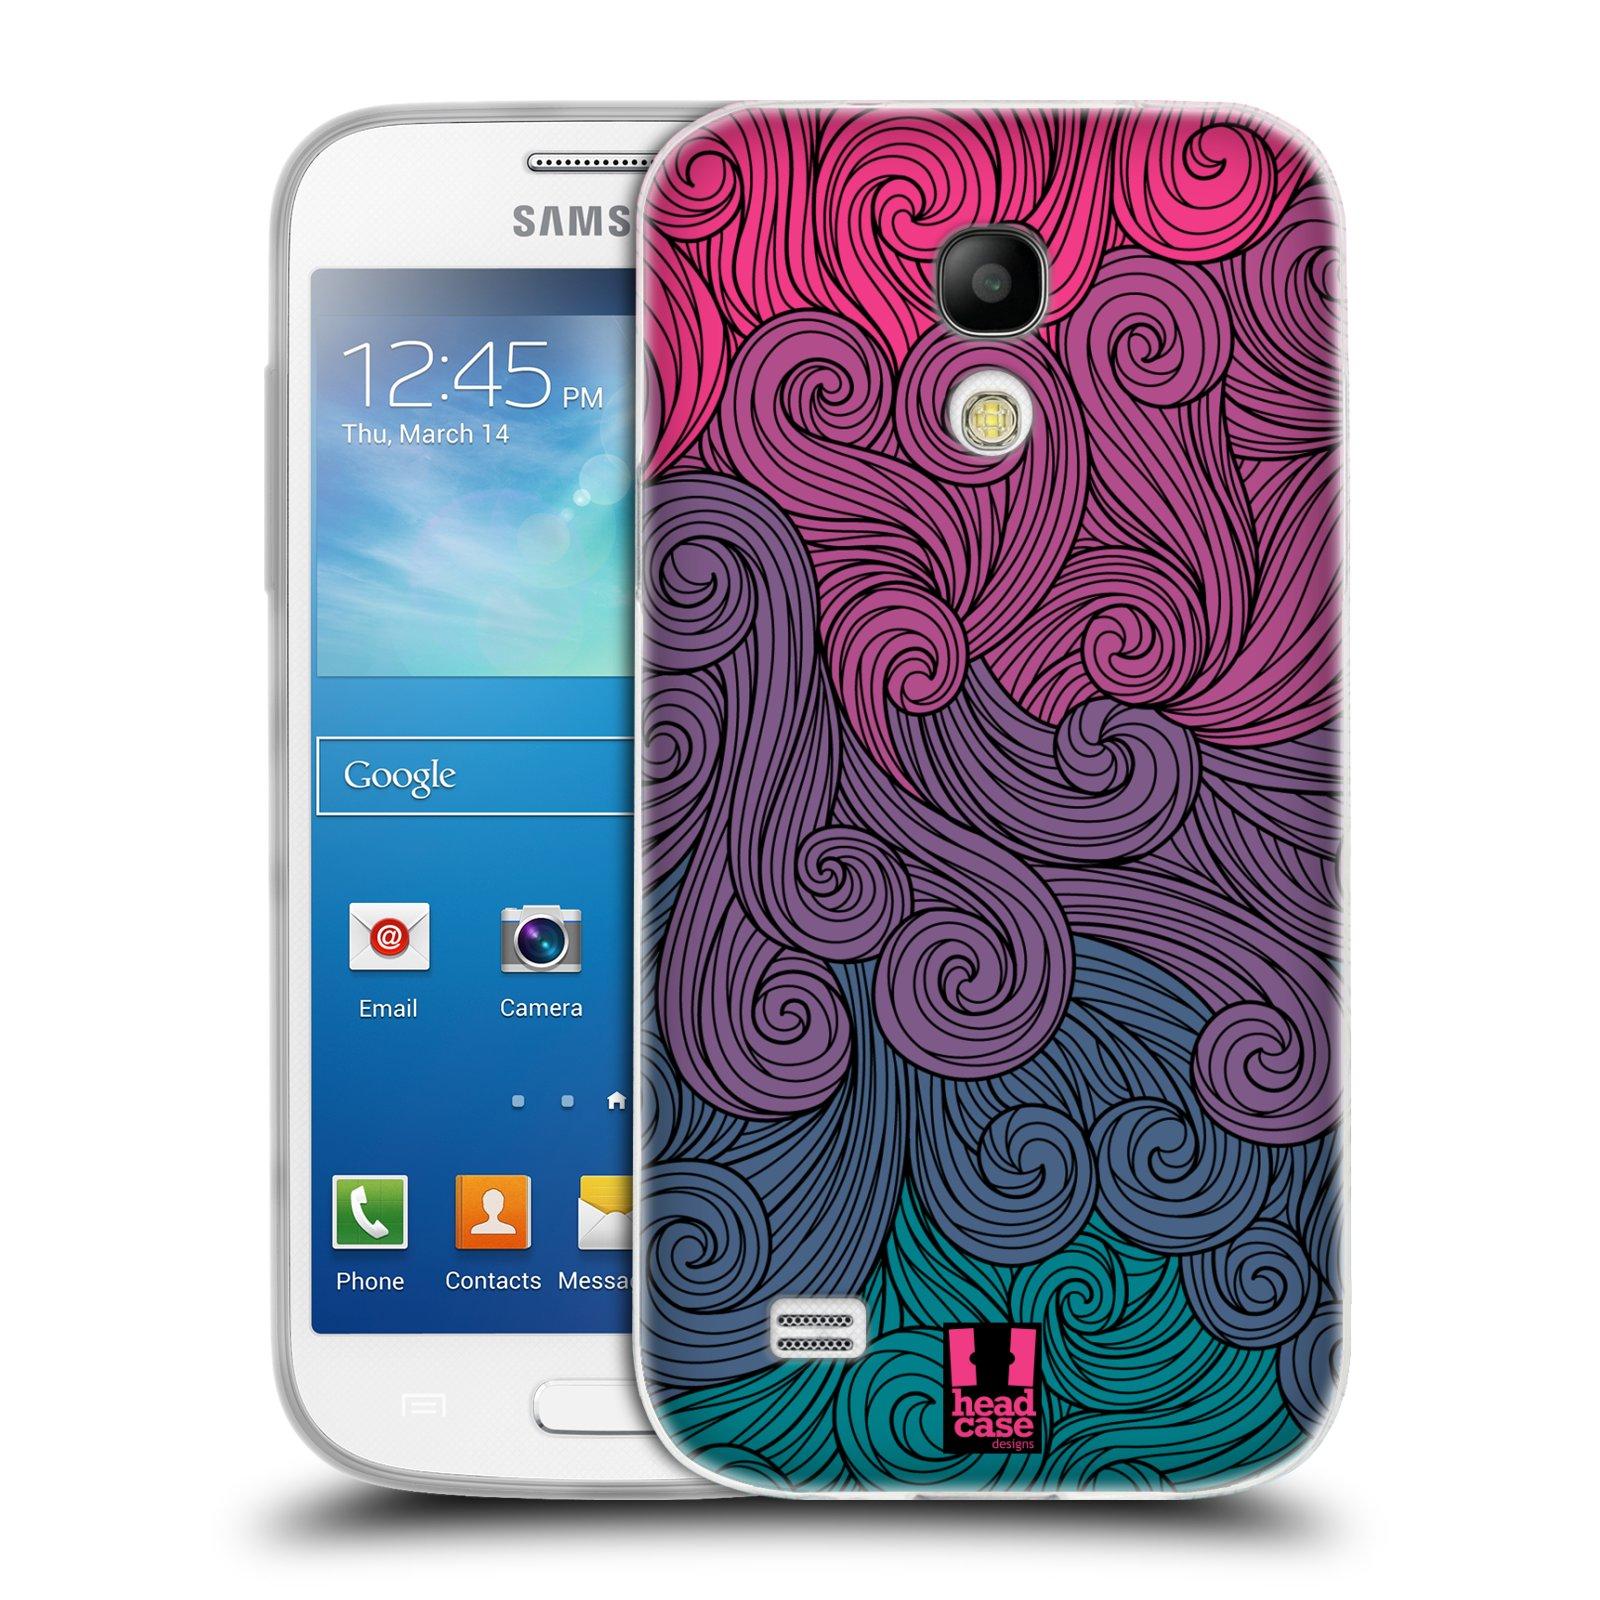 Silikonové pouzdro na mobil Samsung Galaxy S4 Mini HEAD CASE Swirls Hot Pink (Silikonový kryt či obal na mobilní telefon Samsung Galaxy S4 Mini GT-i9195 / i9190)